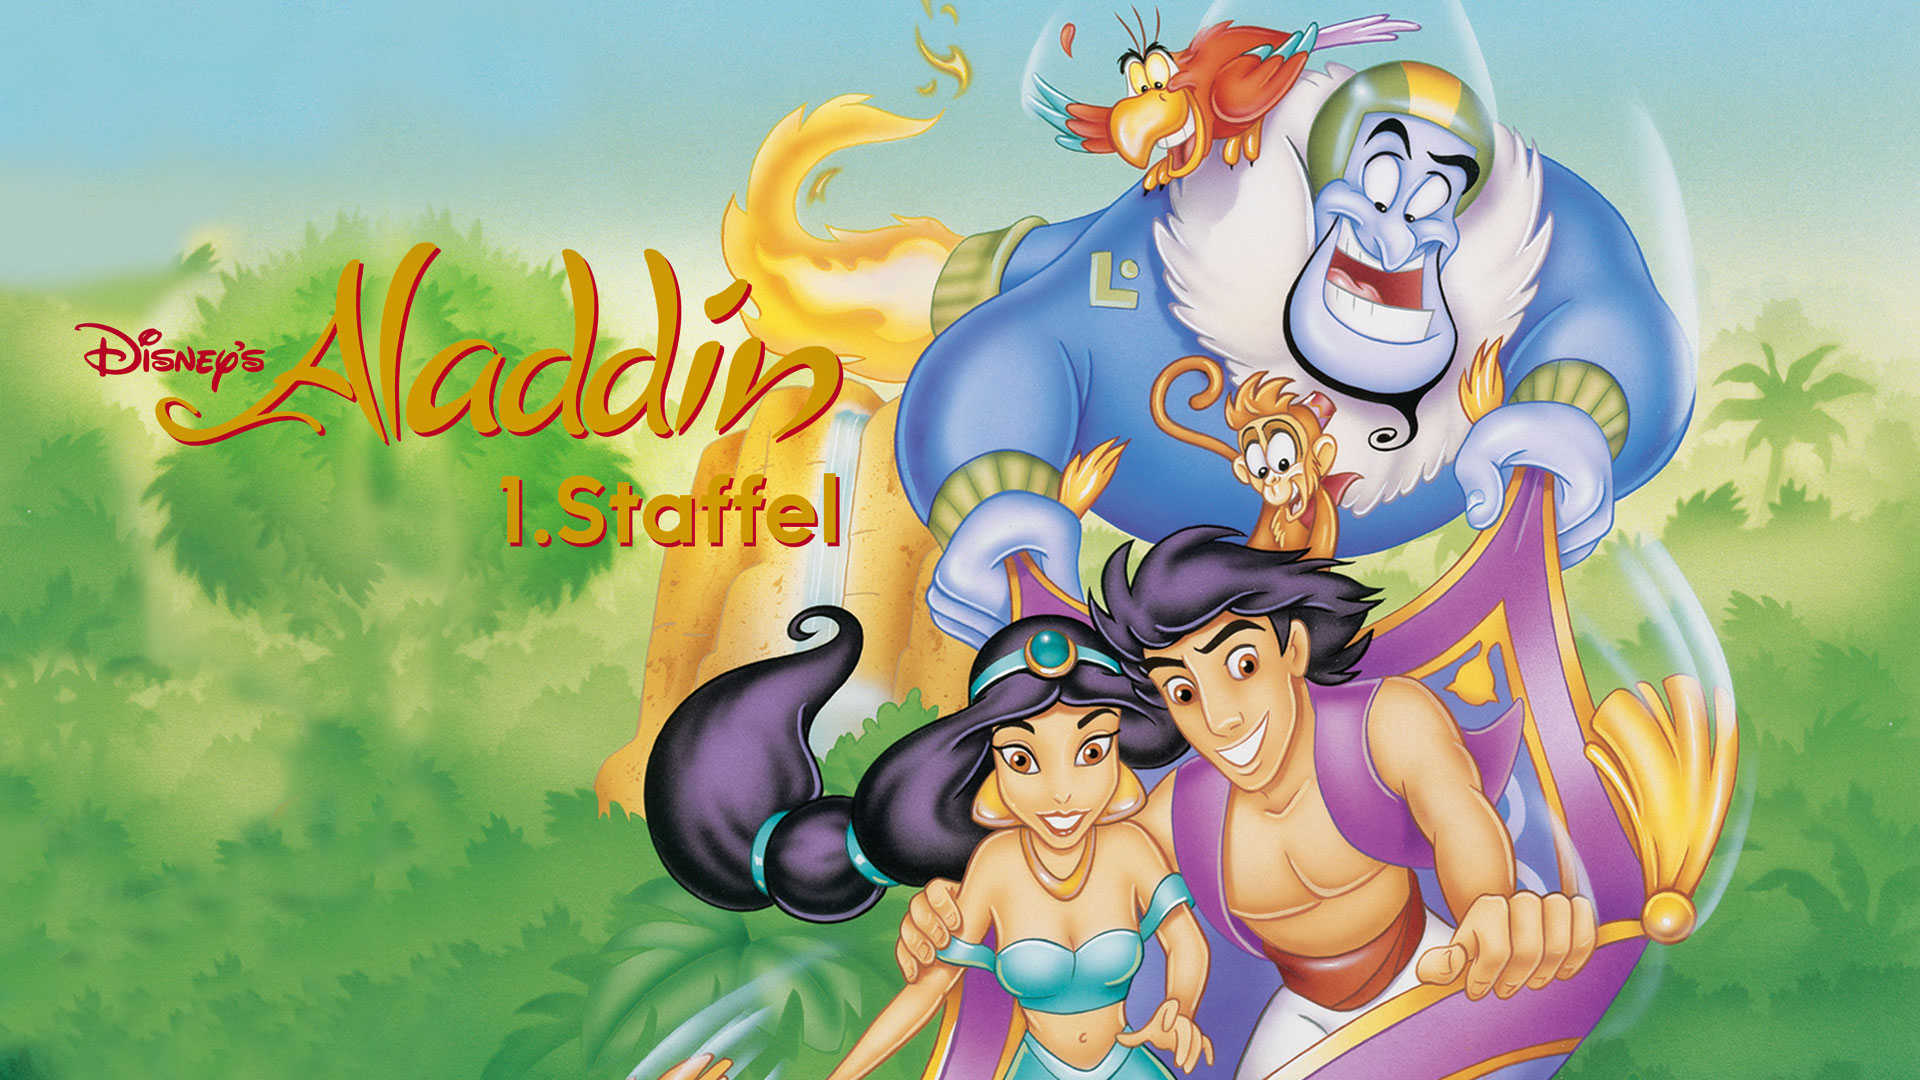 Disneys Aladdin - Staffel 1 Teil 1